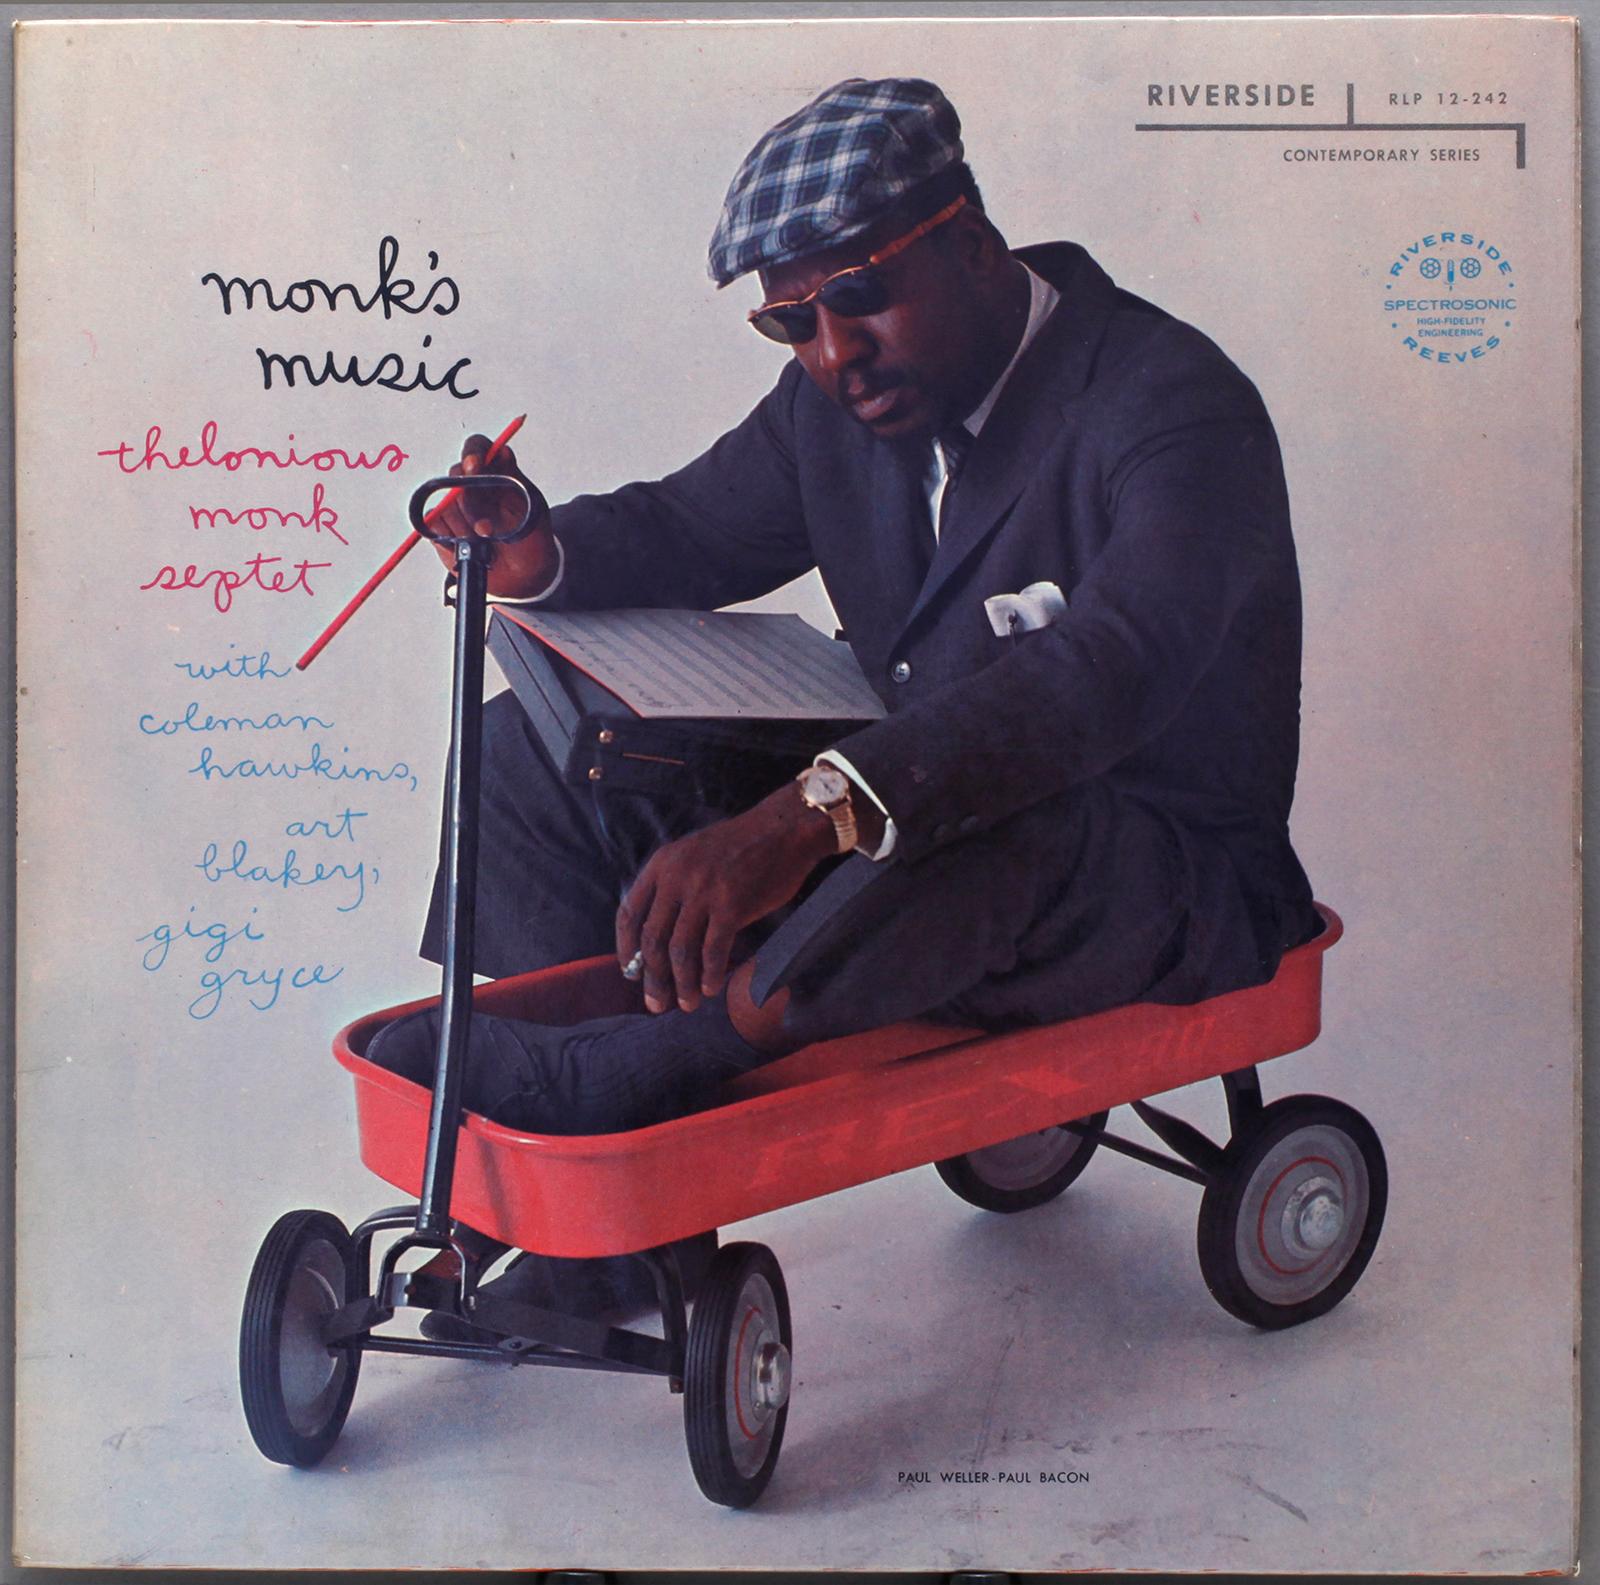 Monk's Music , Thelonious Monk, 1957